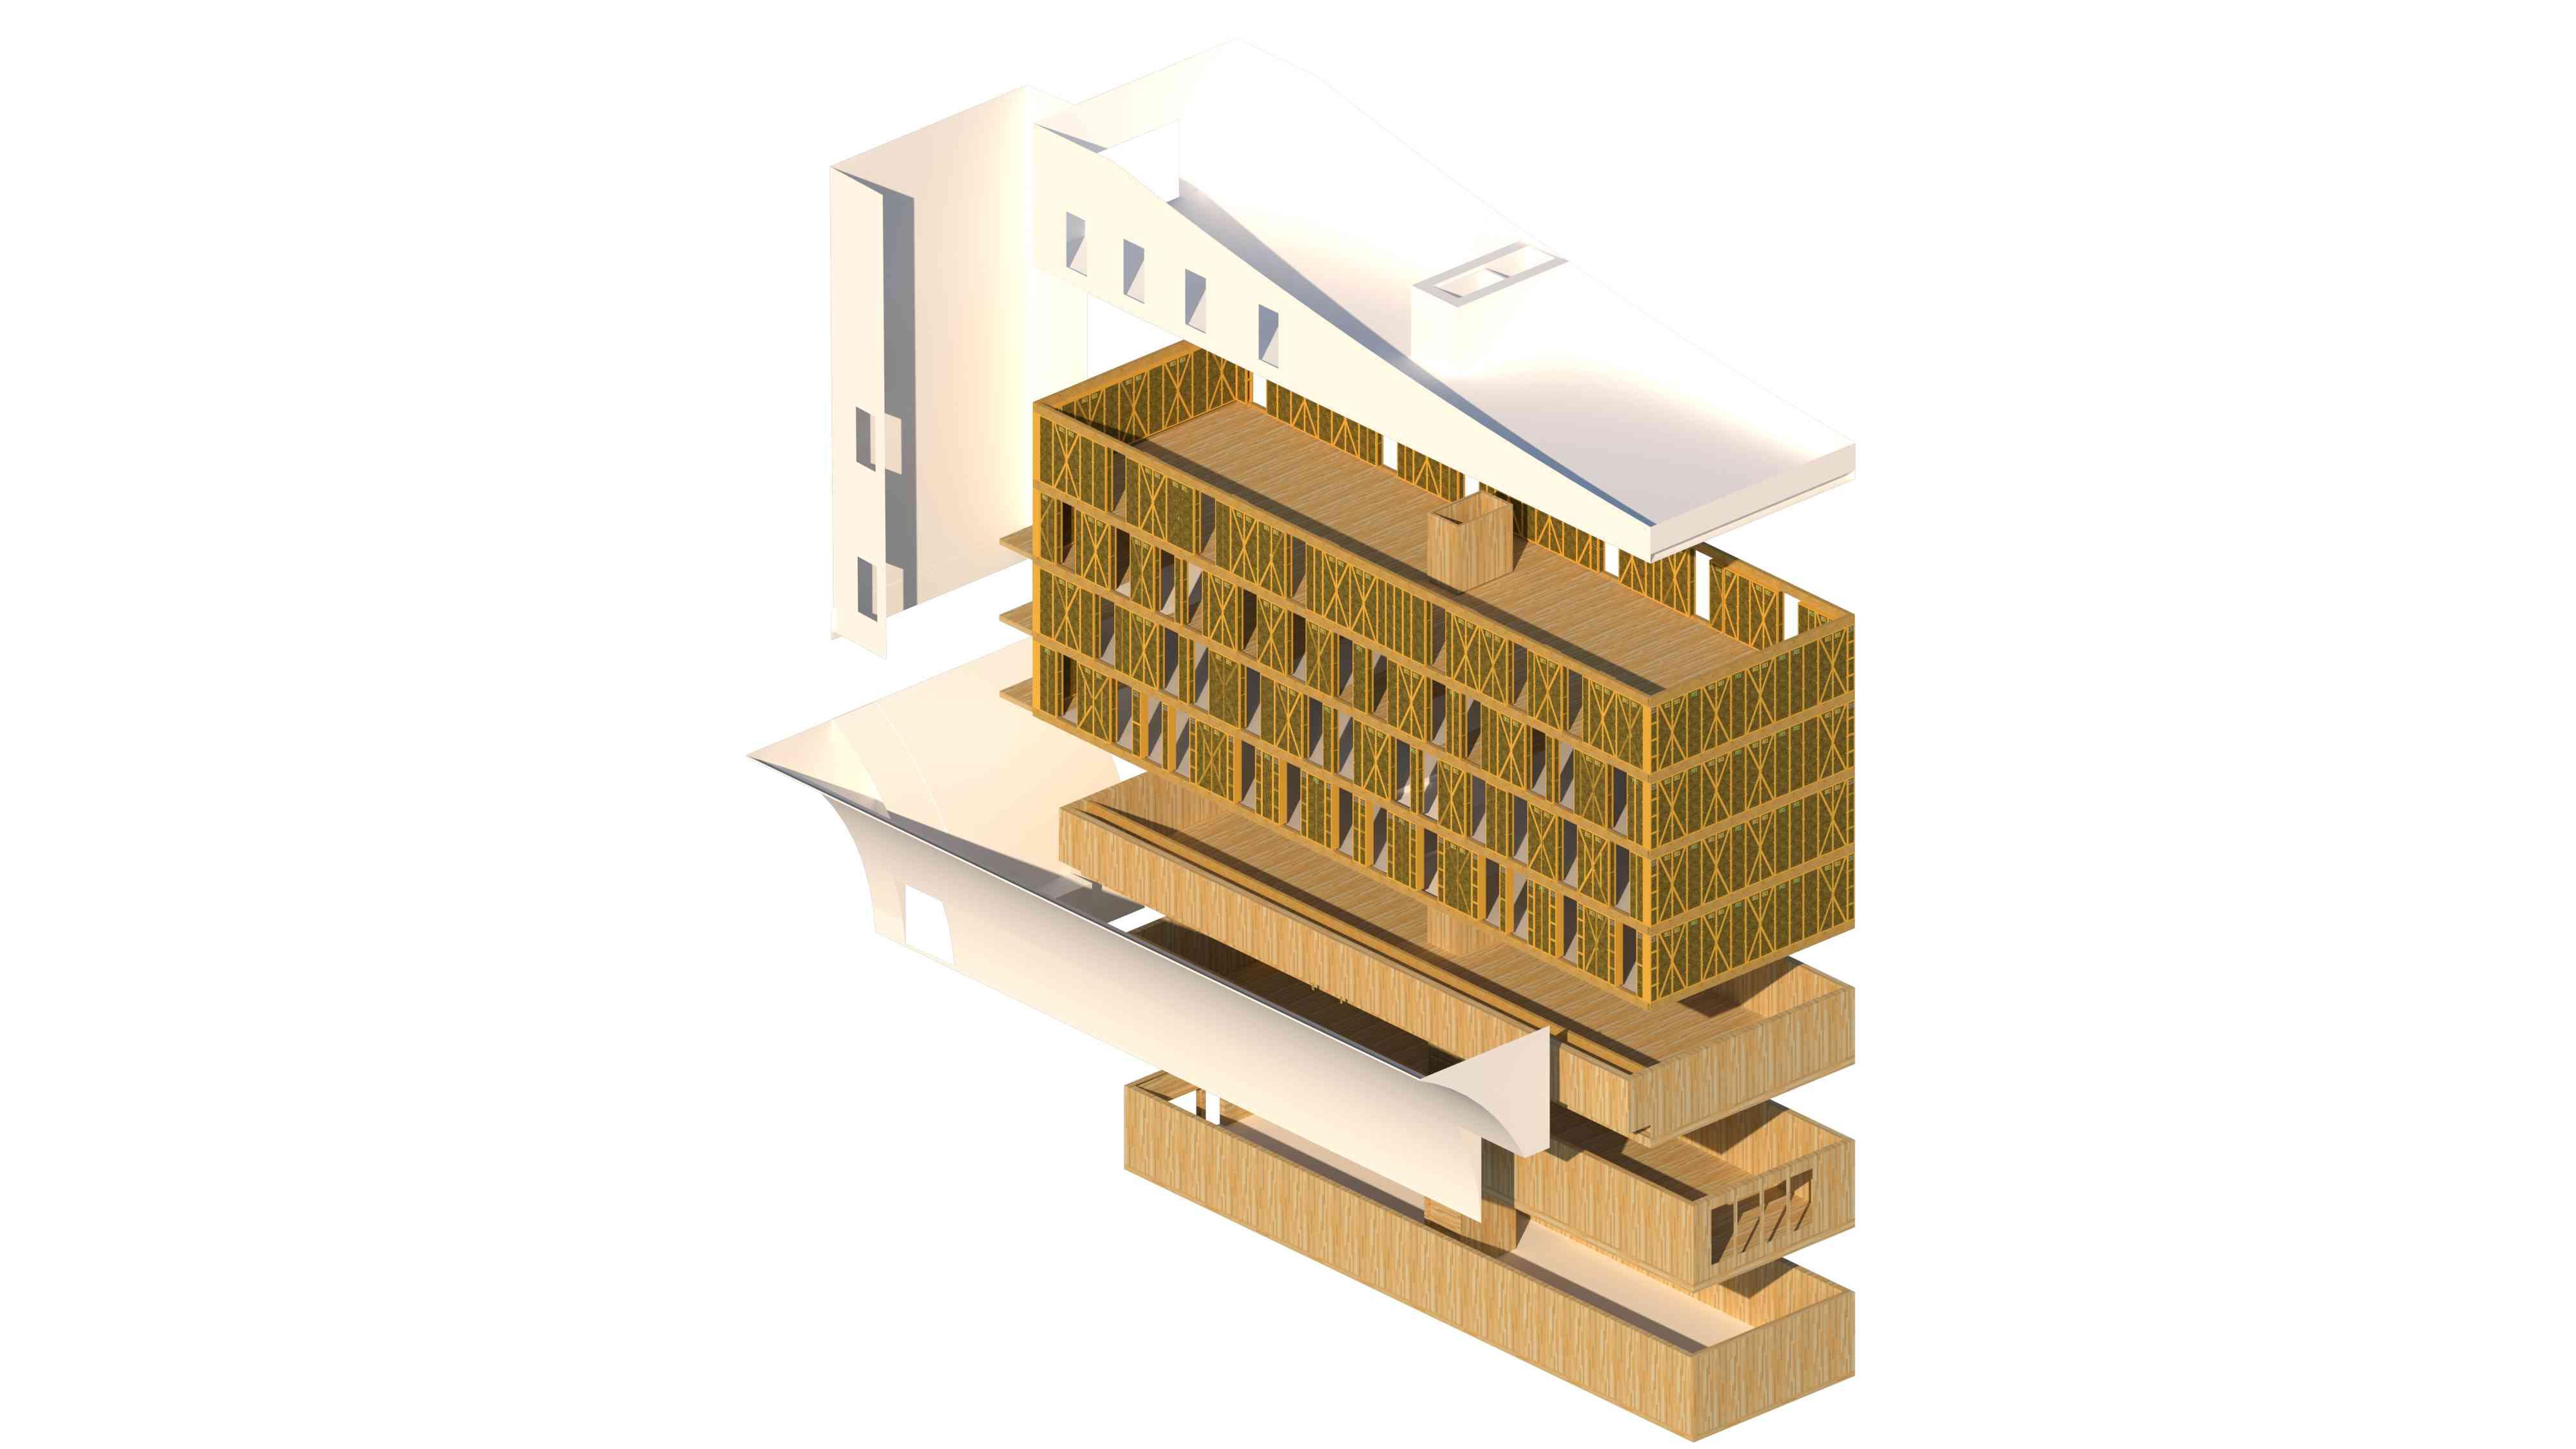 Timber frame of building